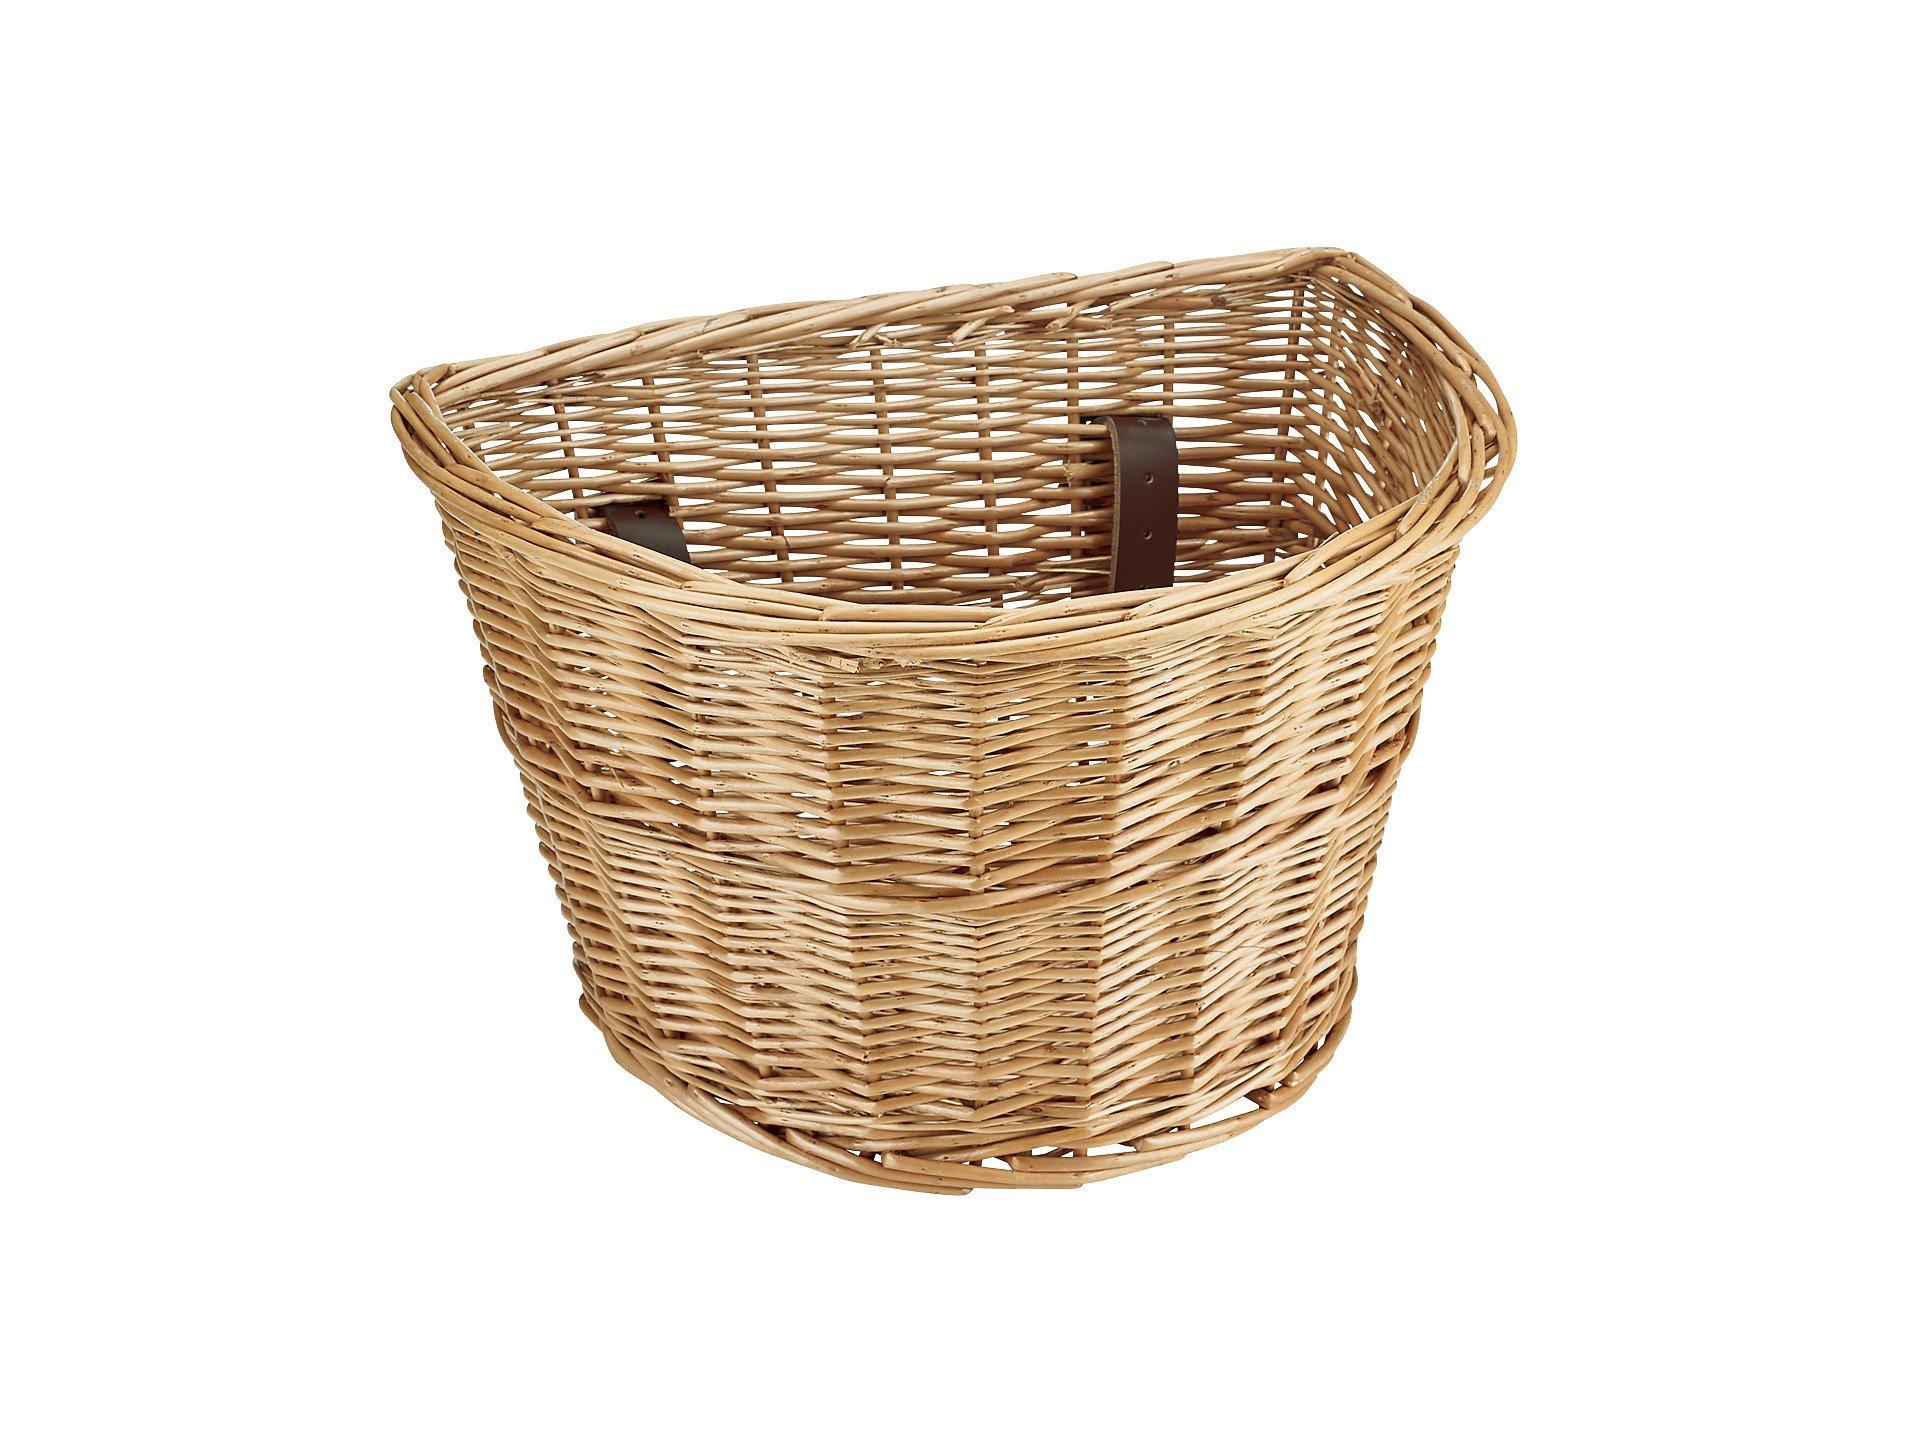 Electra Cruiser Wicker Basket